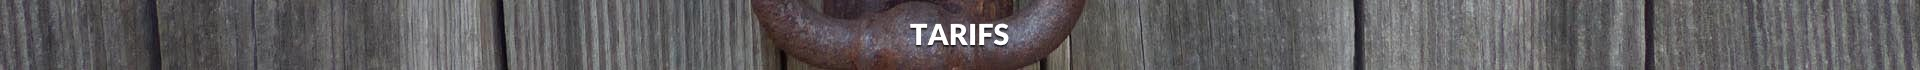 tariffe2_fr